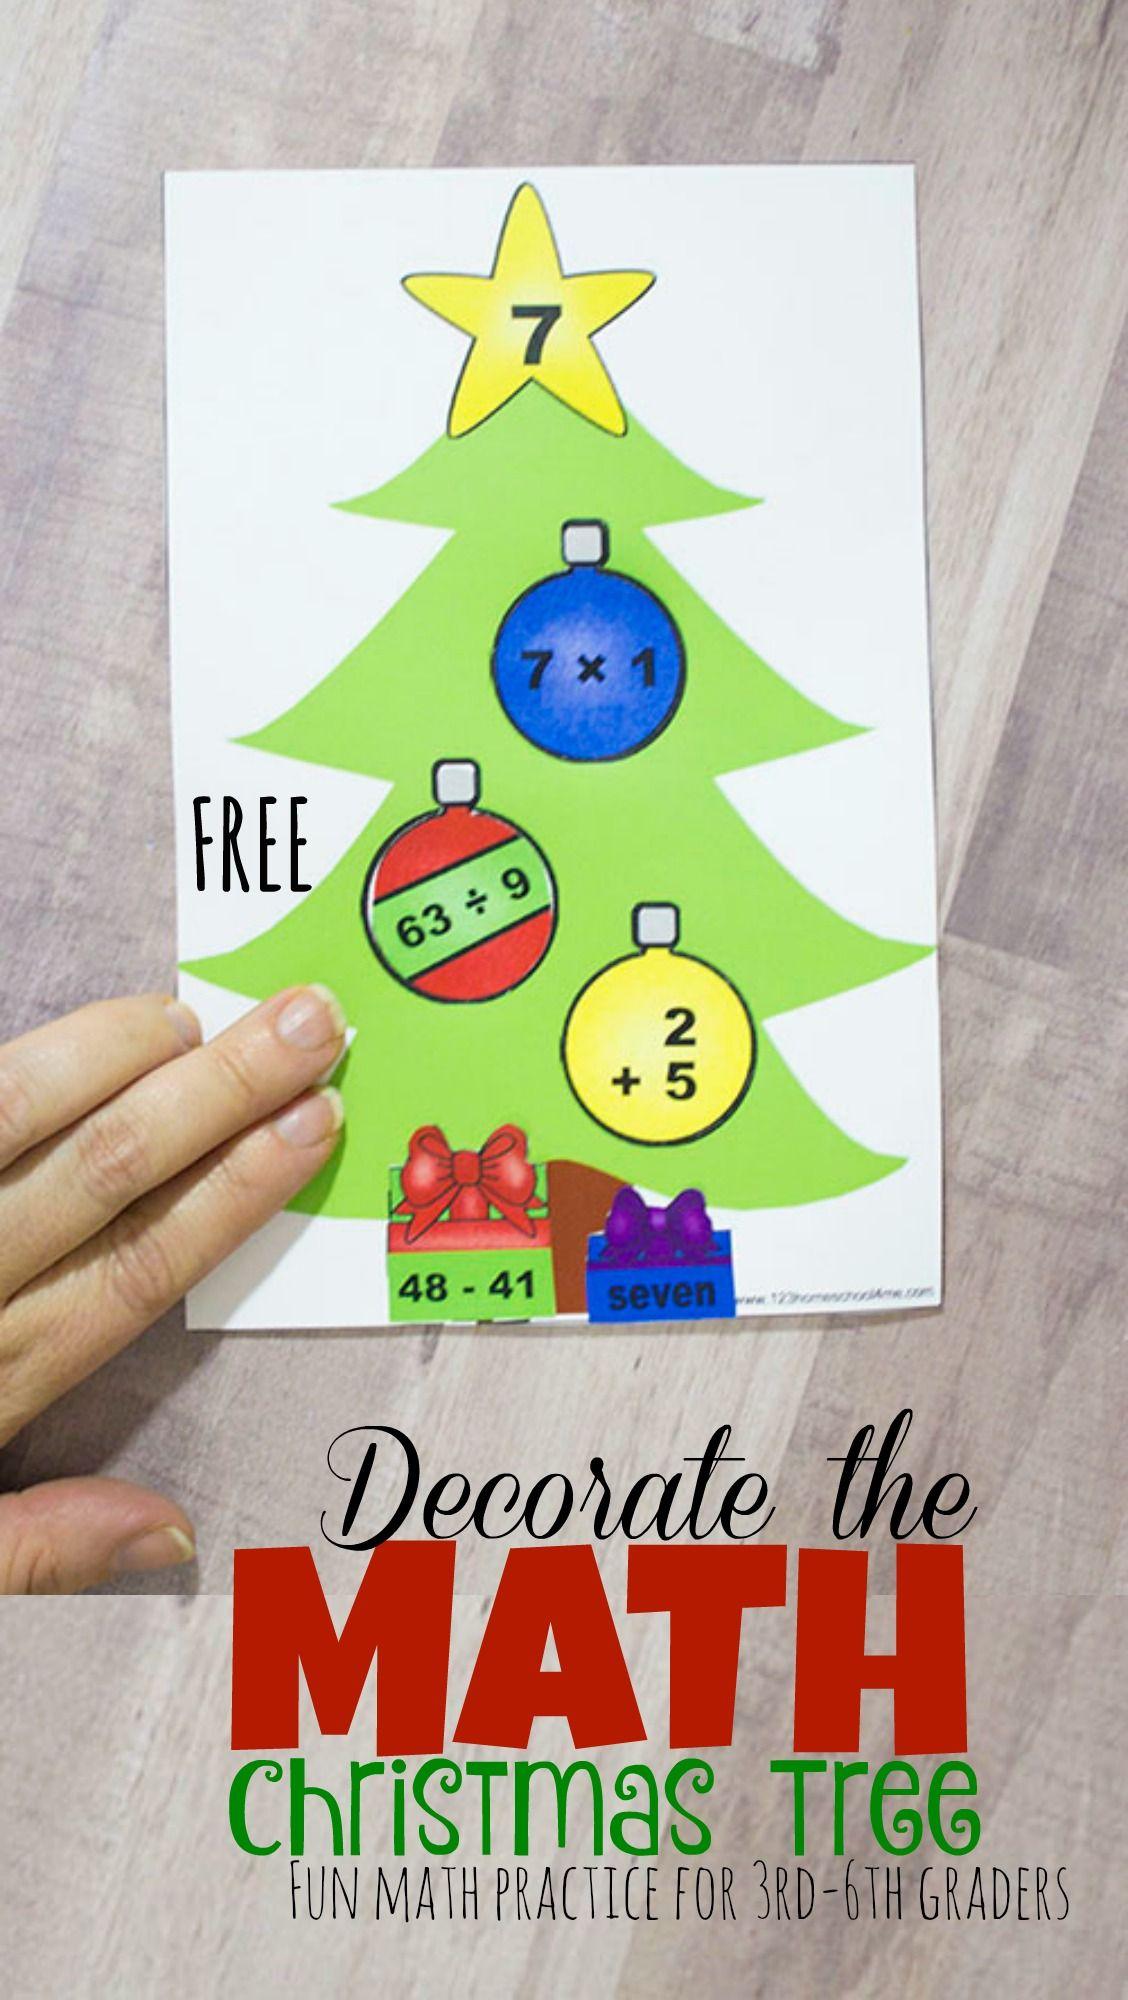 FREE Decorate the Math Christmas Trees | Christmas math, Math ...